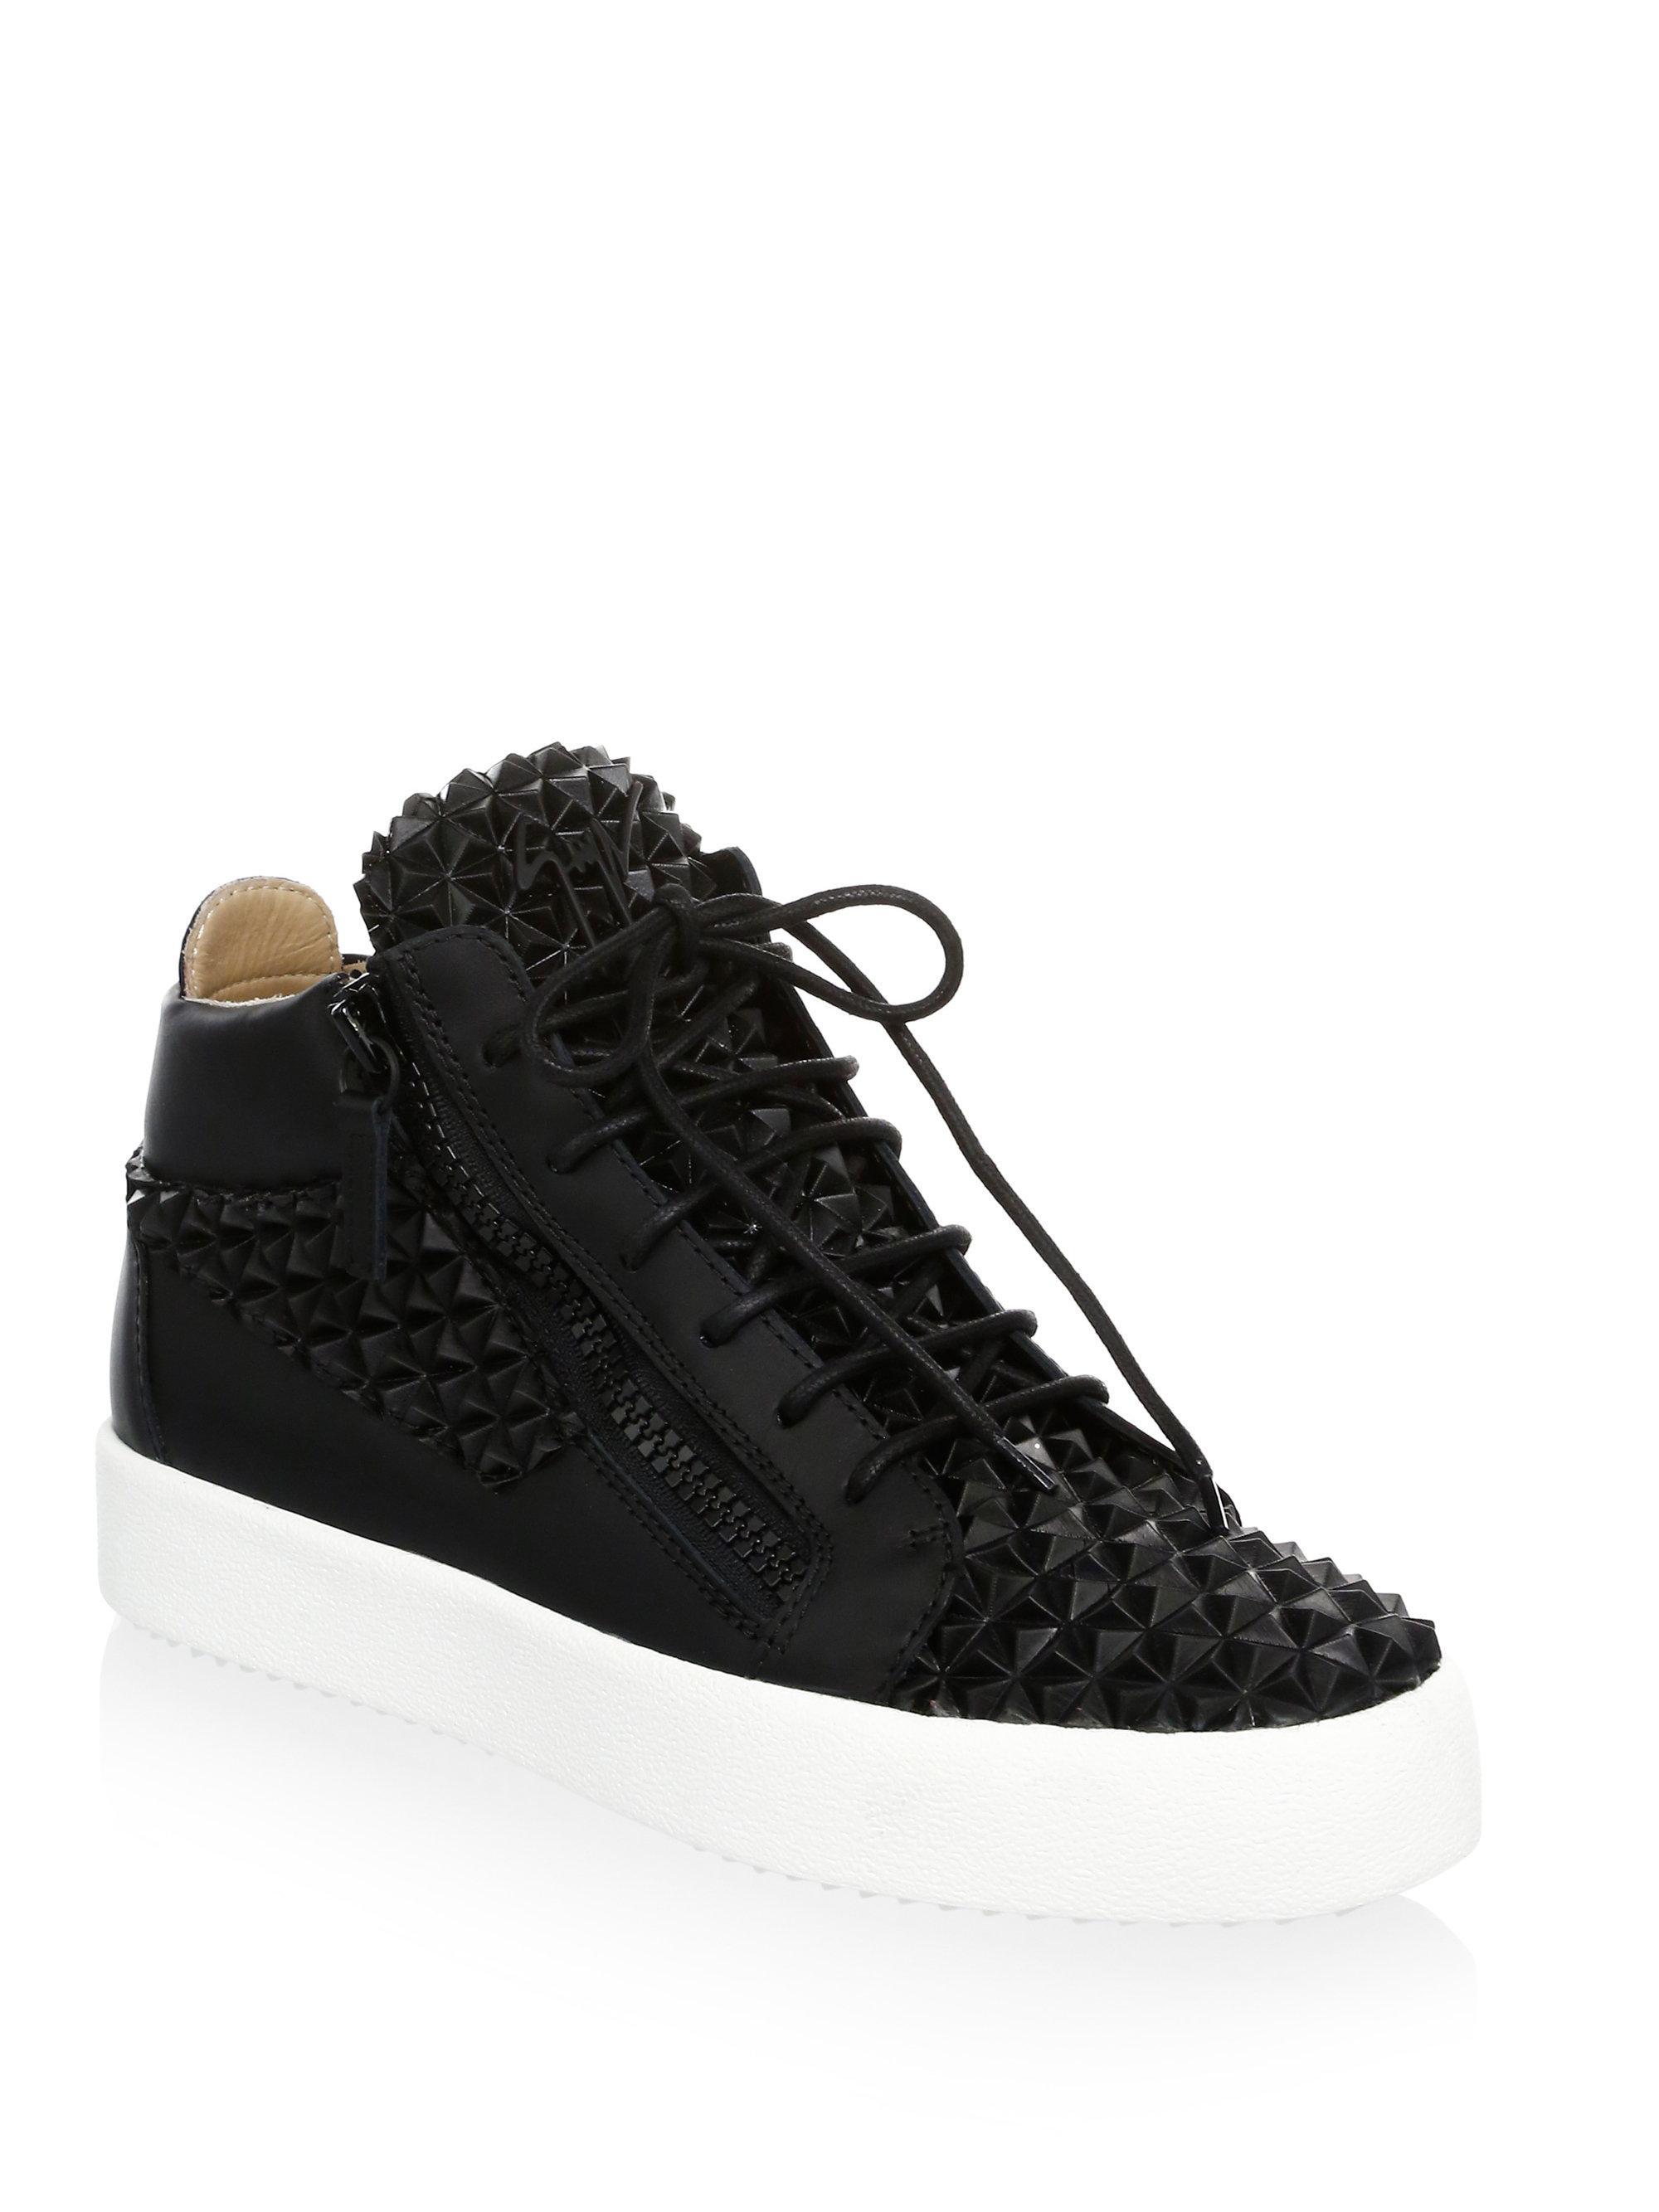 Giuseppe Zanotti. Women's Black Gradient Leather Mid-top Sneakers